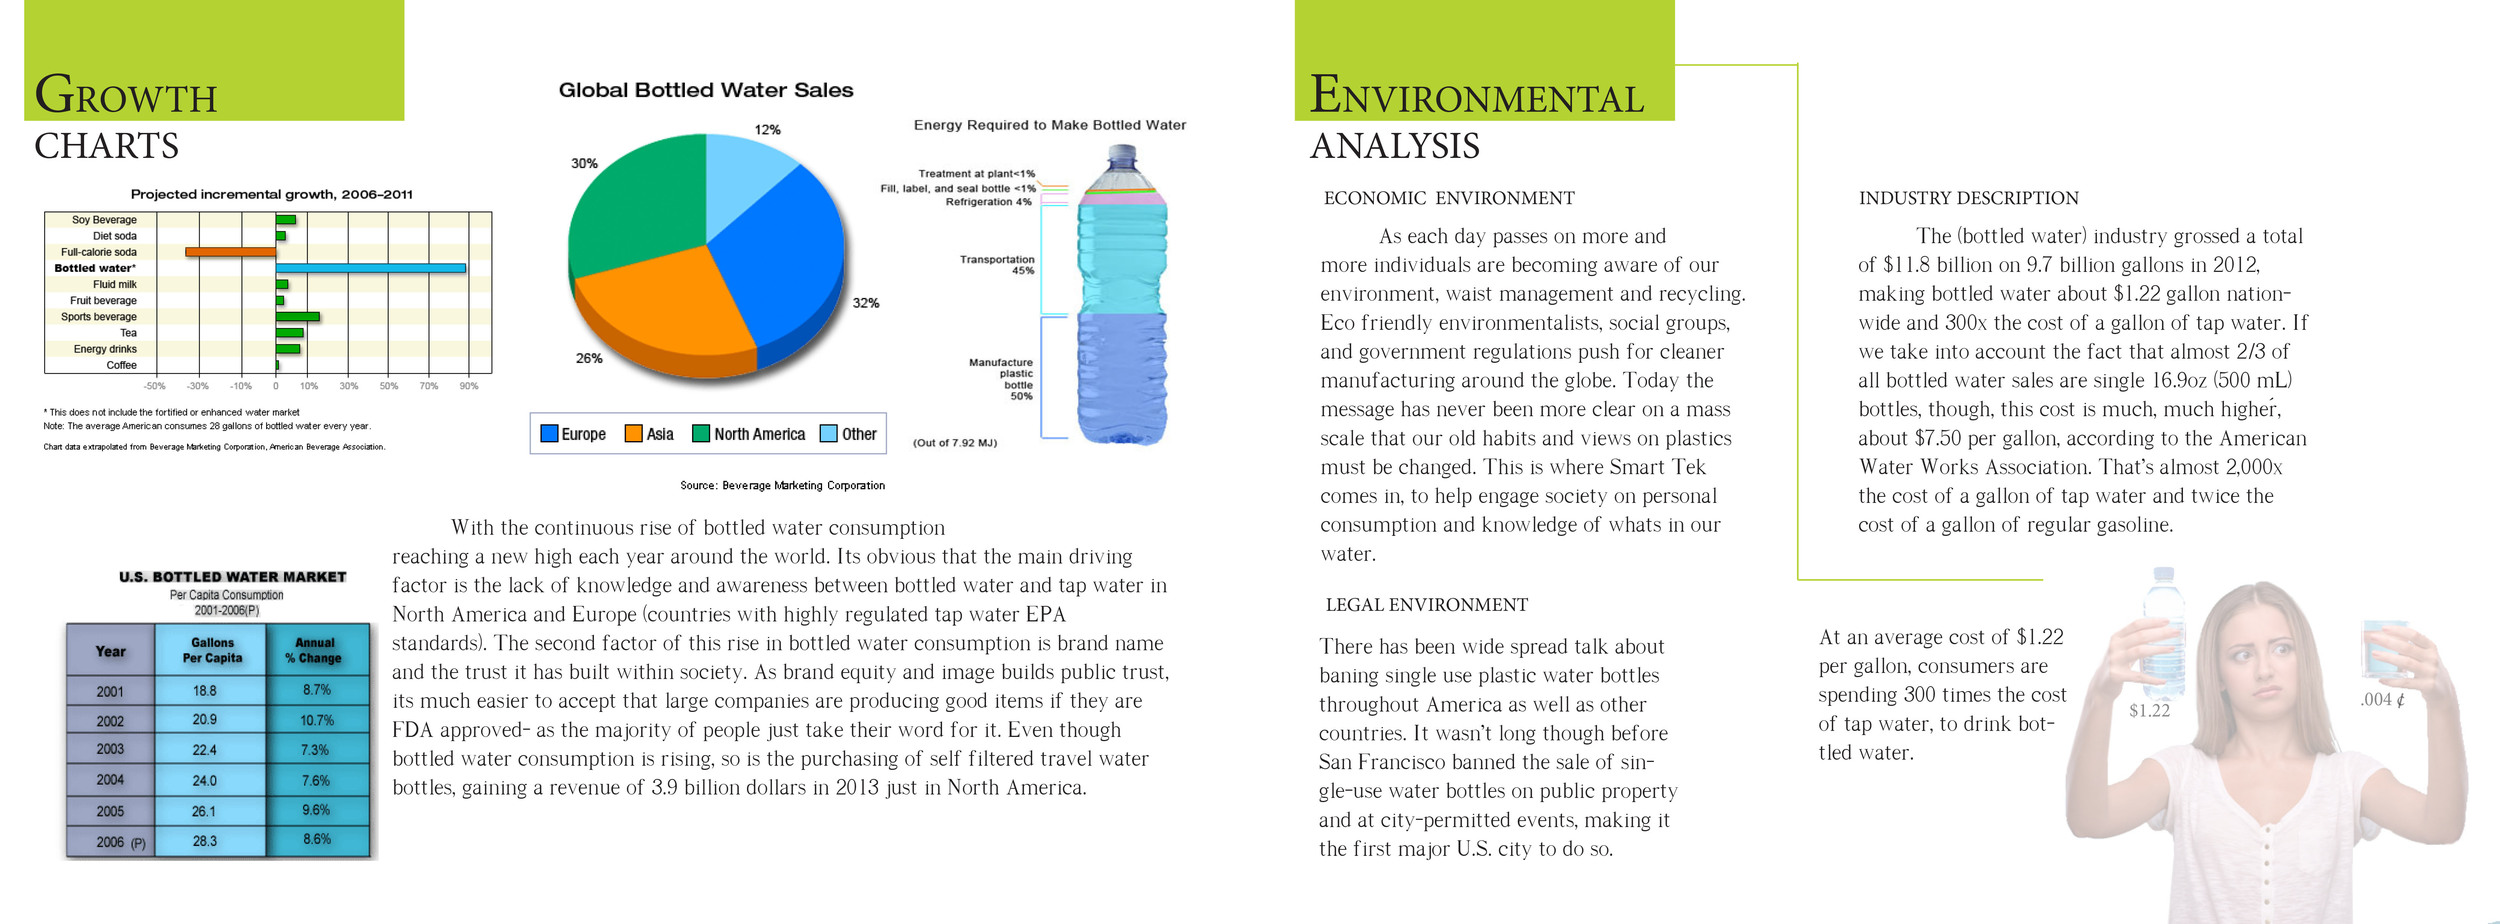 water bottle fesibility Alex M Speer-6.jpg